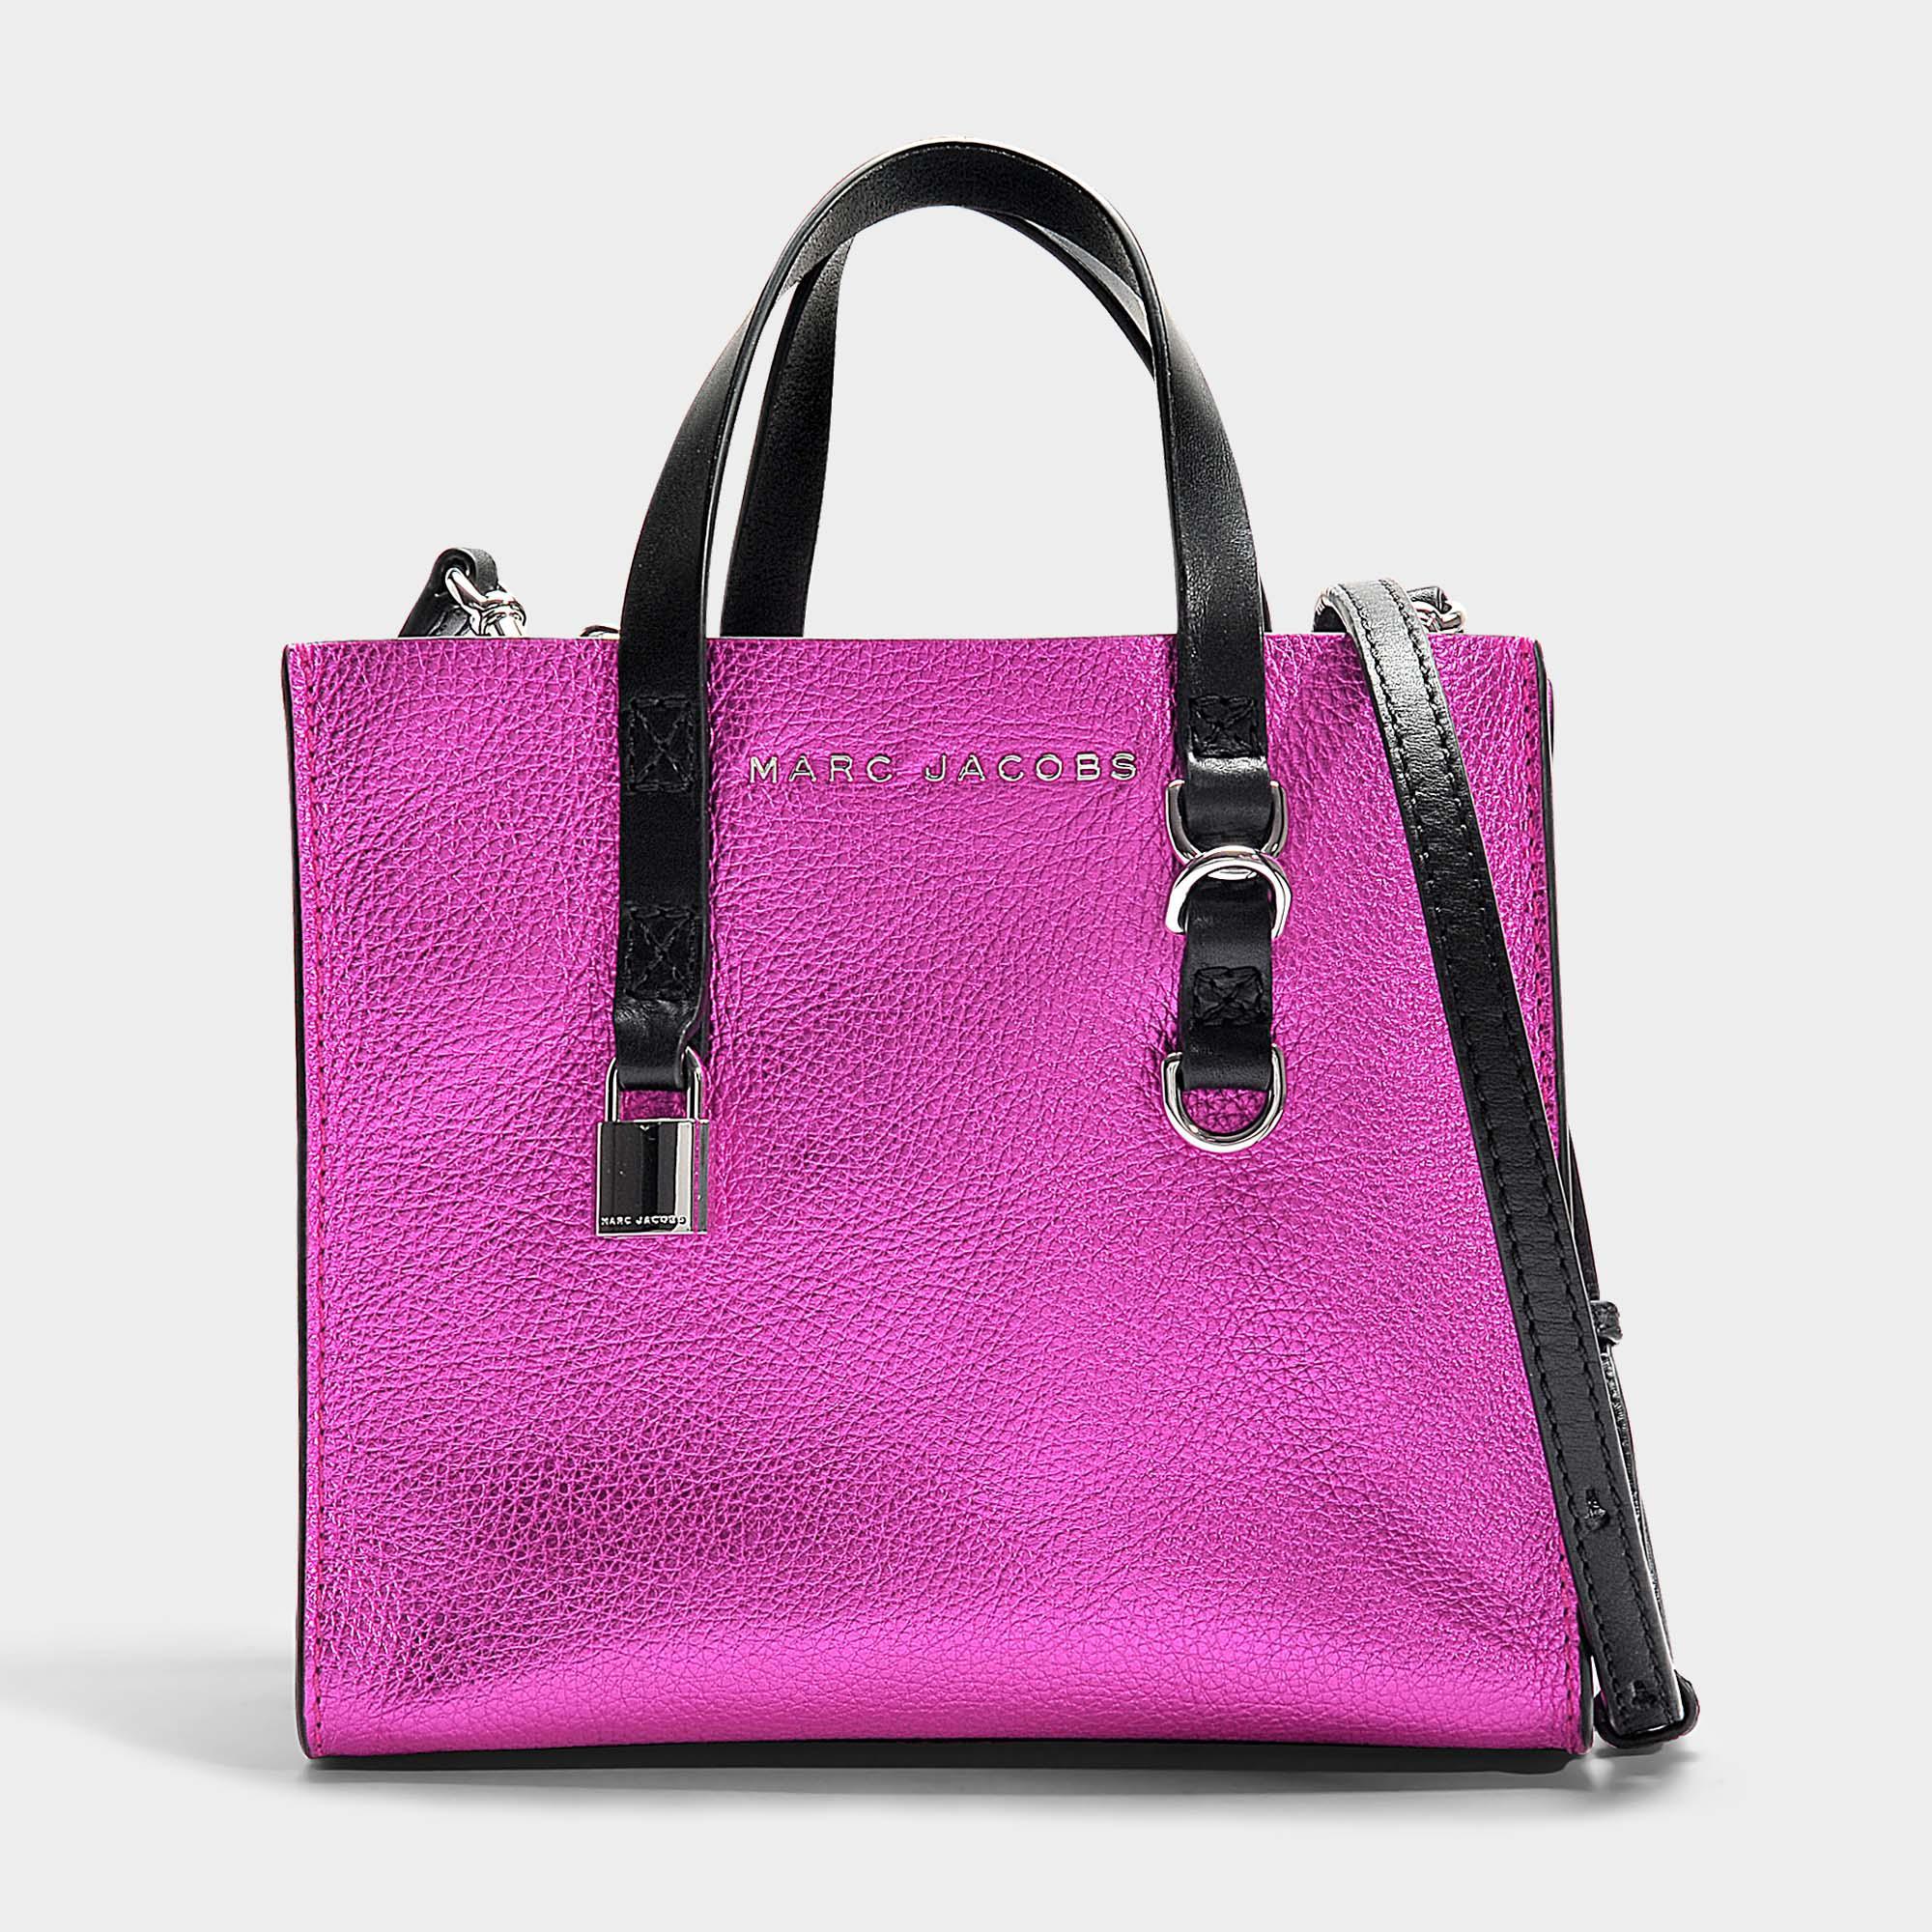 e84f0b259309 Marc Jacobs - The Mini Grind Metallic Bag In Pink Metallic Calfskin - Lyst.  View fullscreen